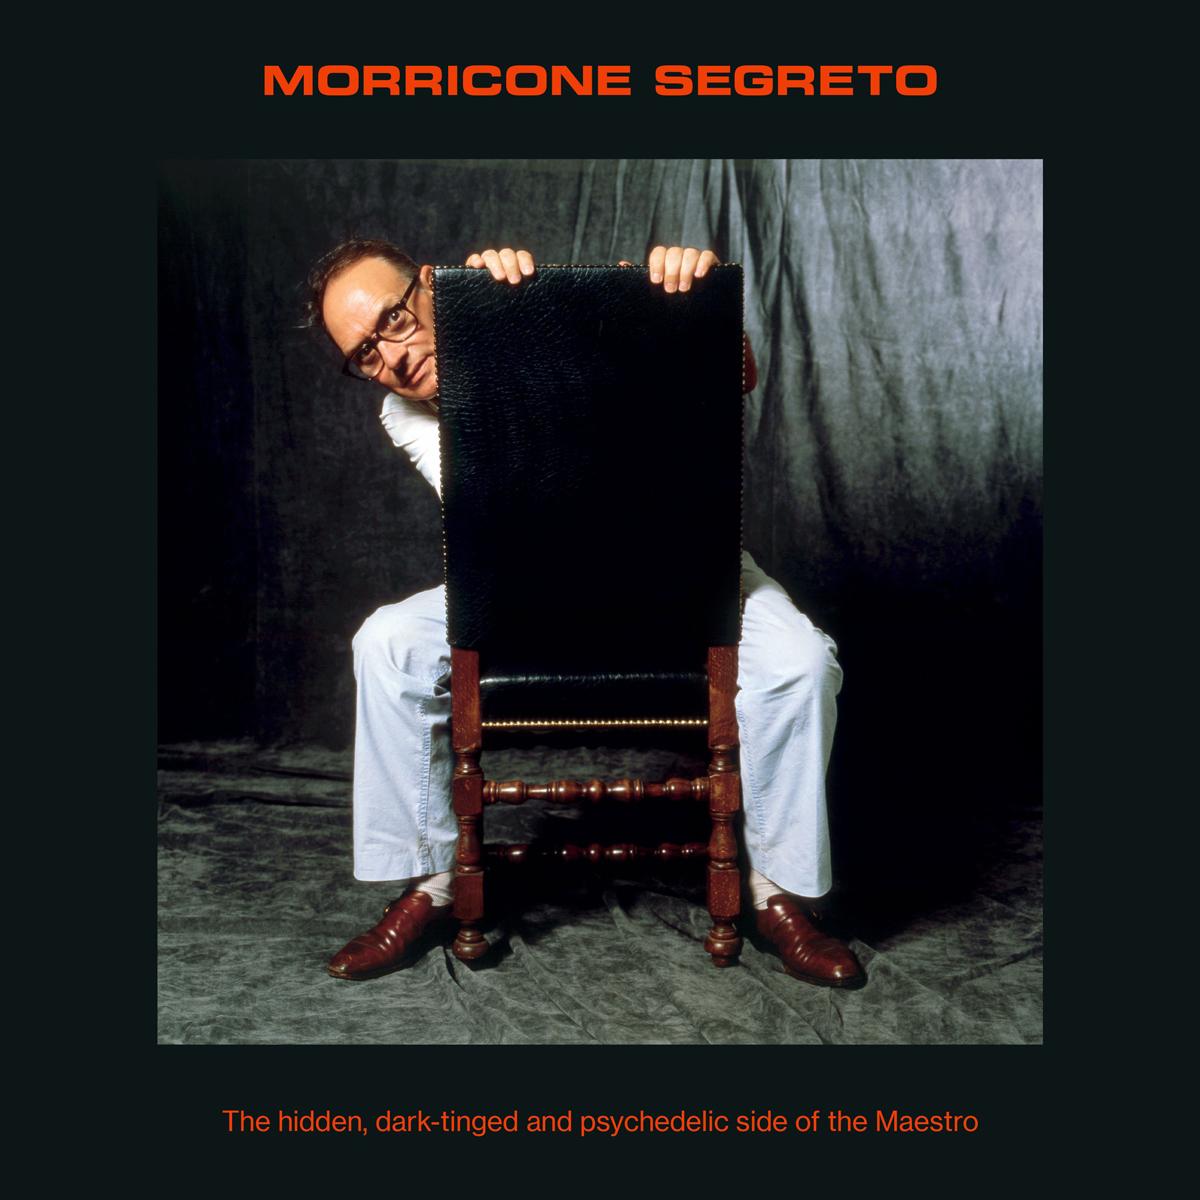 Ennio Morricone Morricone Segreto artwork